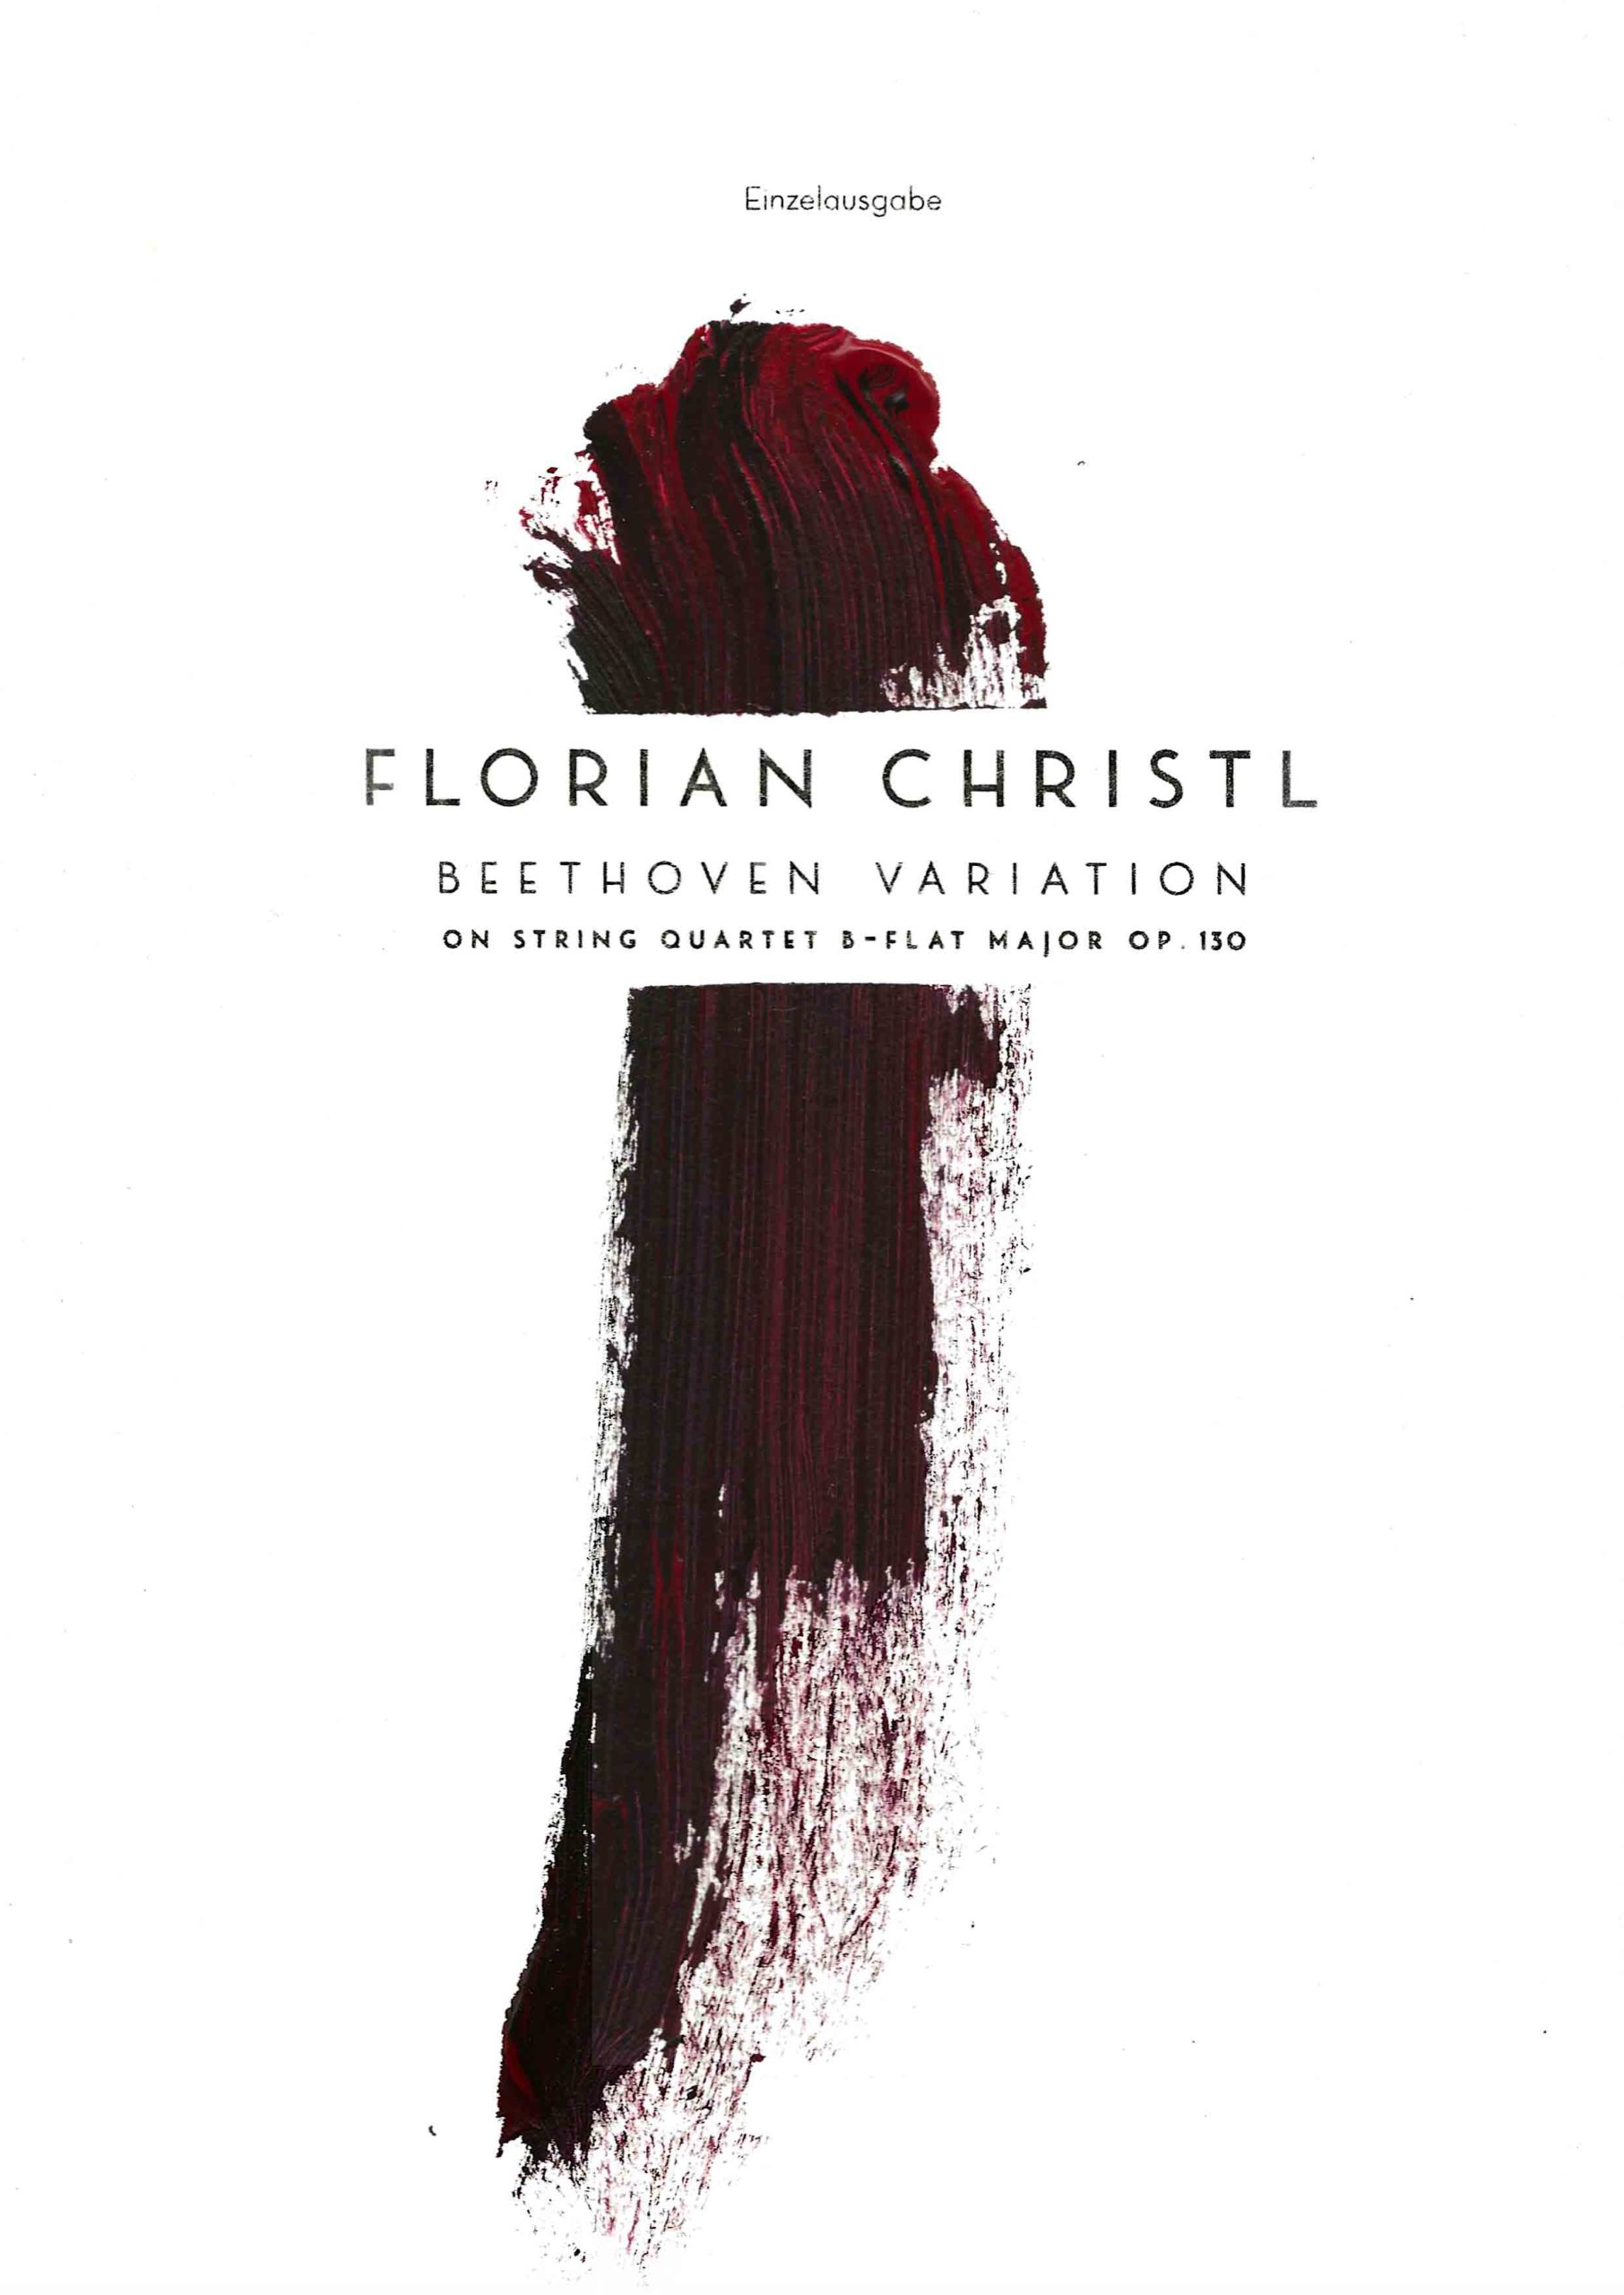 Florian Christl | Music Sheet | Beethoven Variation | 1st edition | 008